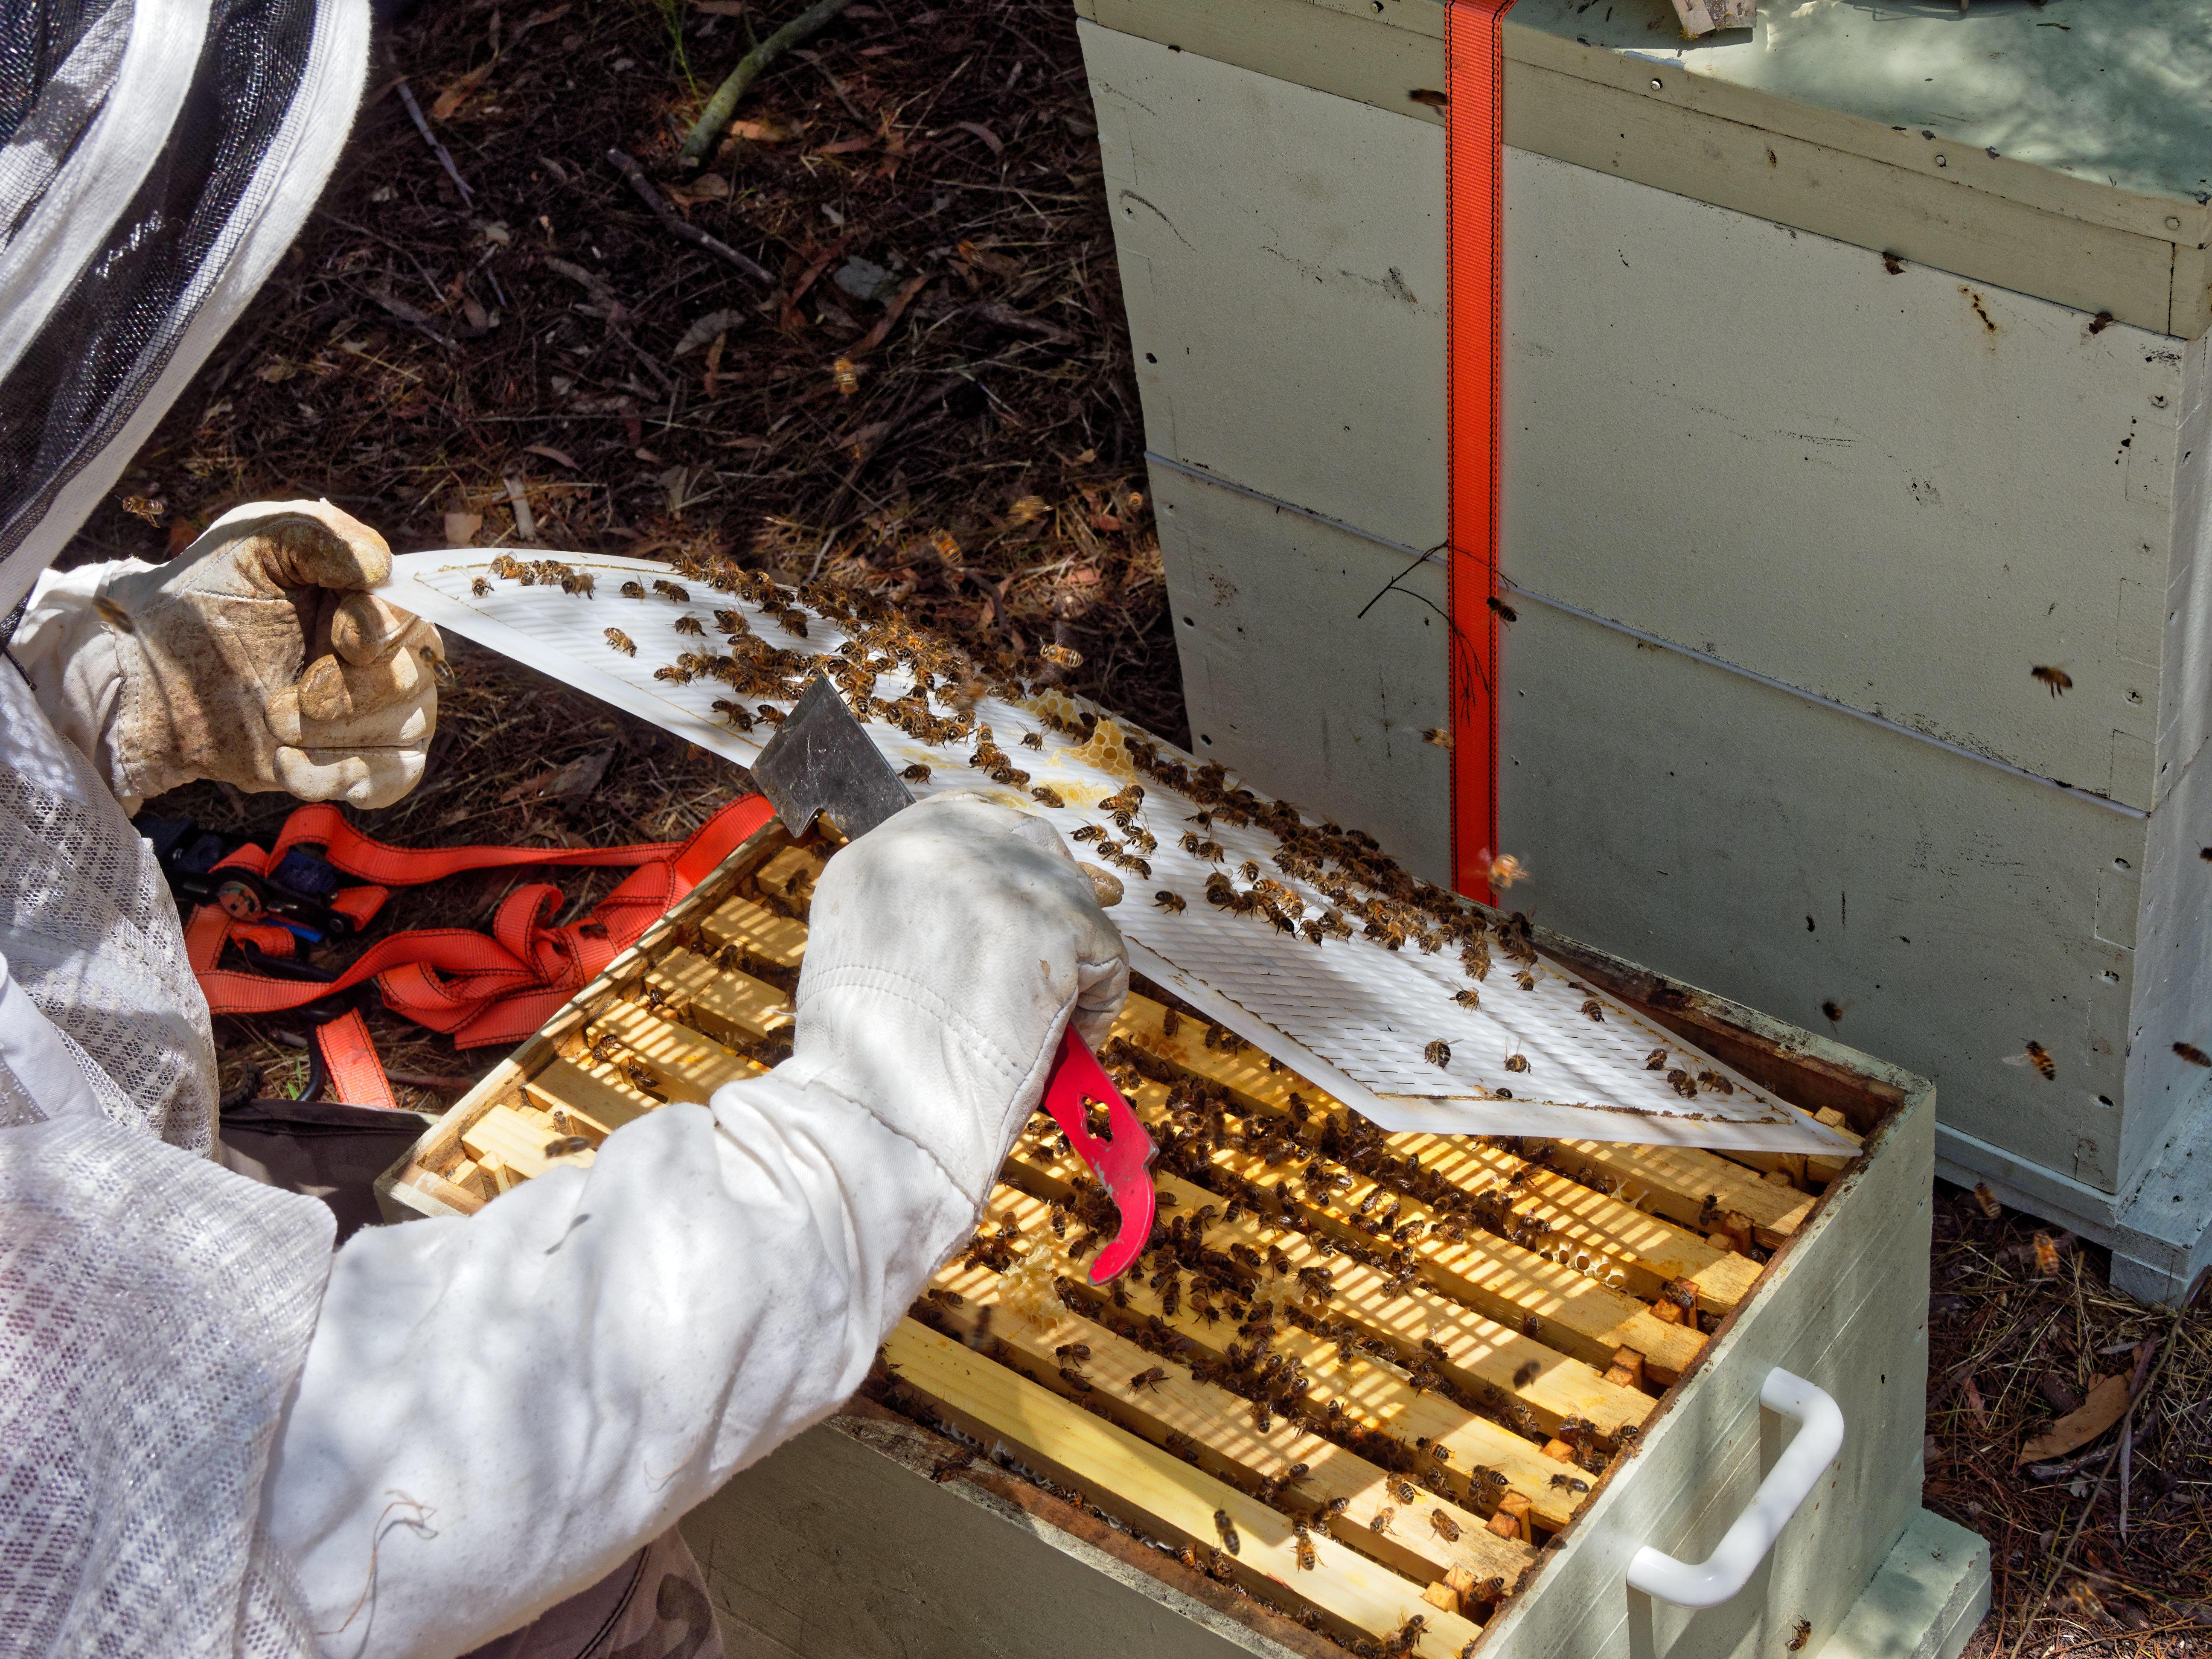 Inspecting-beehives-38.jpeg